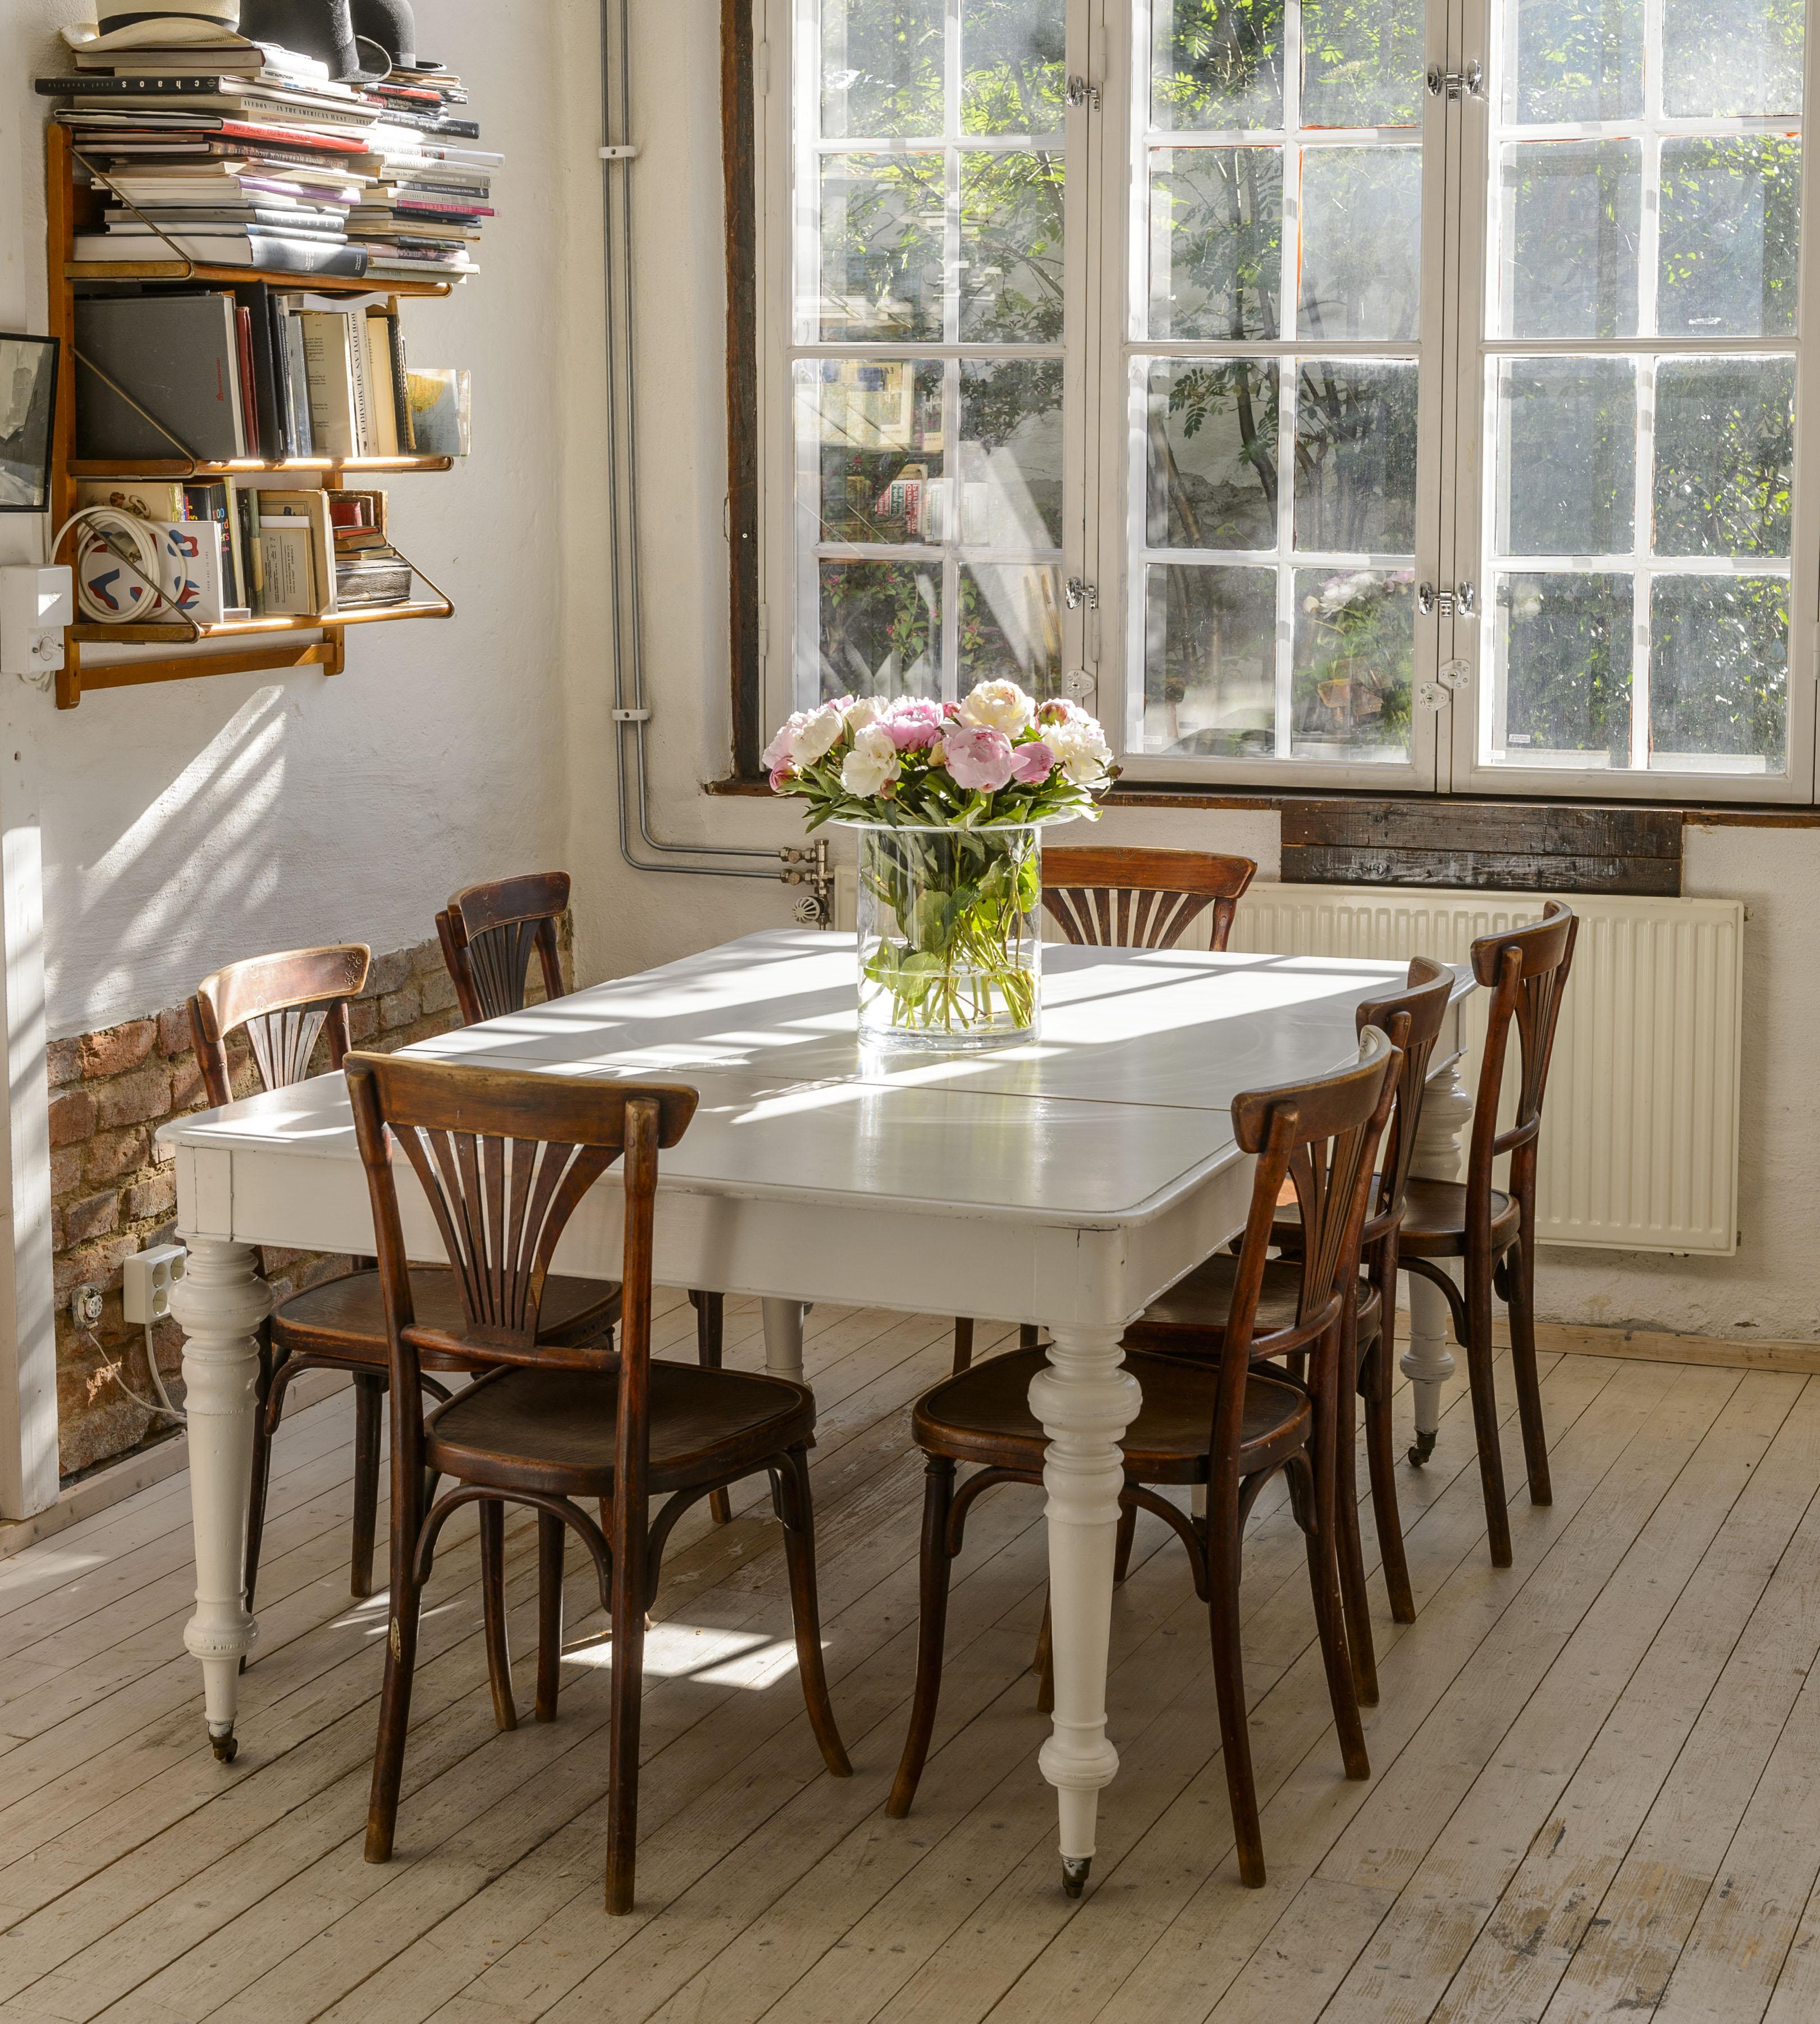 Butik Lanthandeln Stort unikt gammalt matbord SÅLT